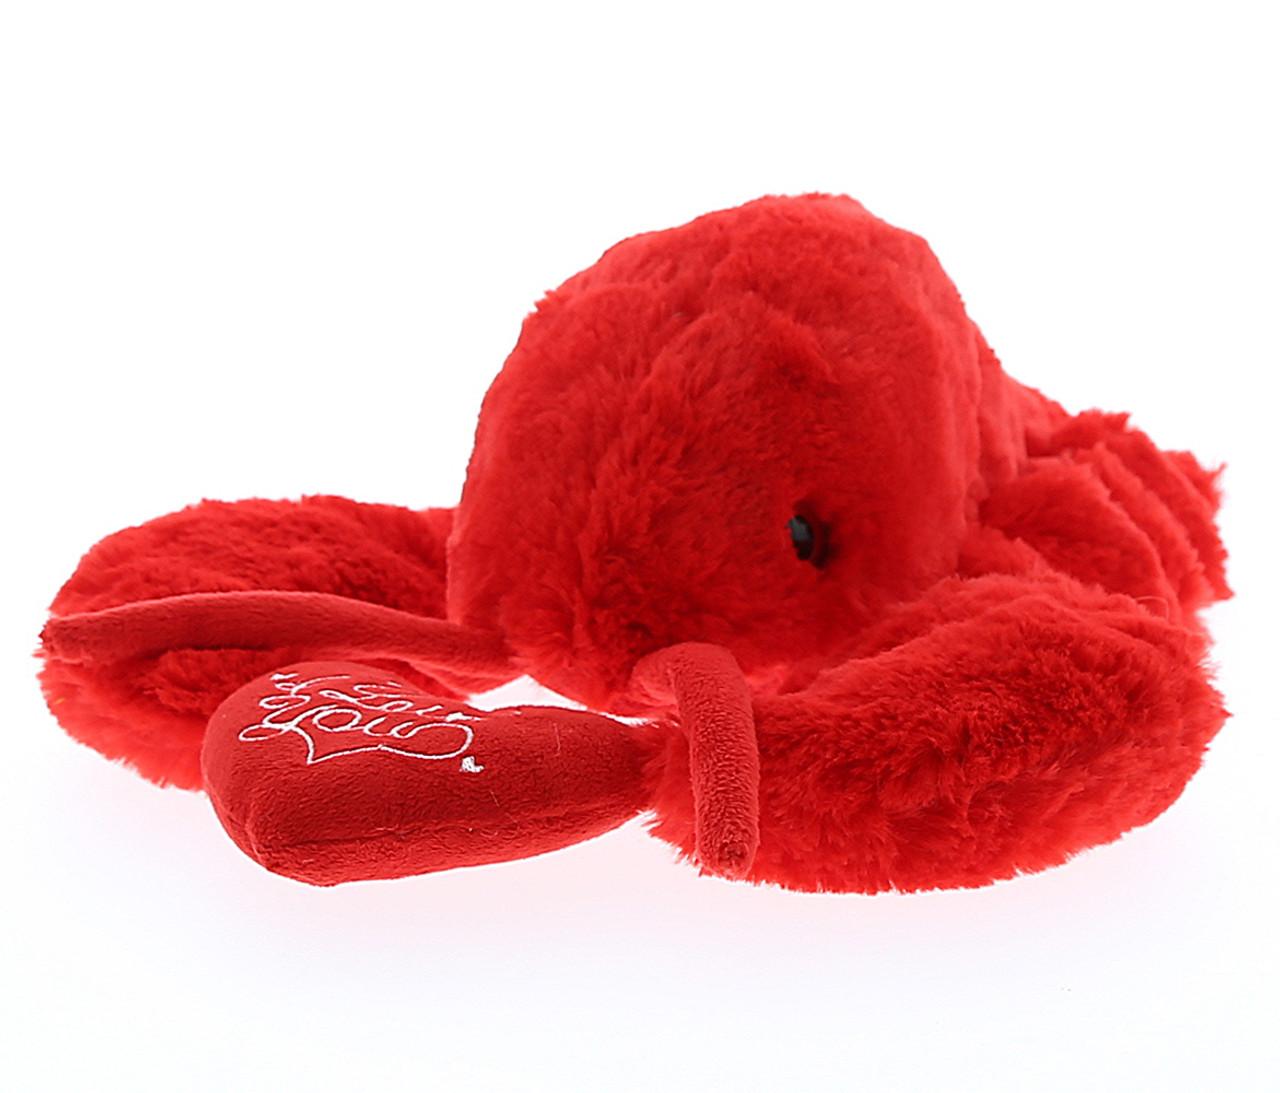 Dollibu Red Lobster I Love You Valentines Plush Super Soft Plush